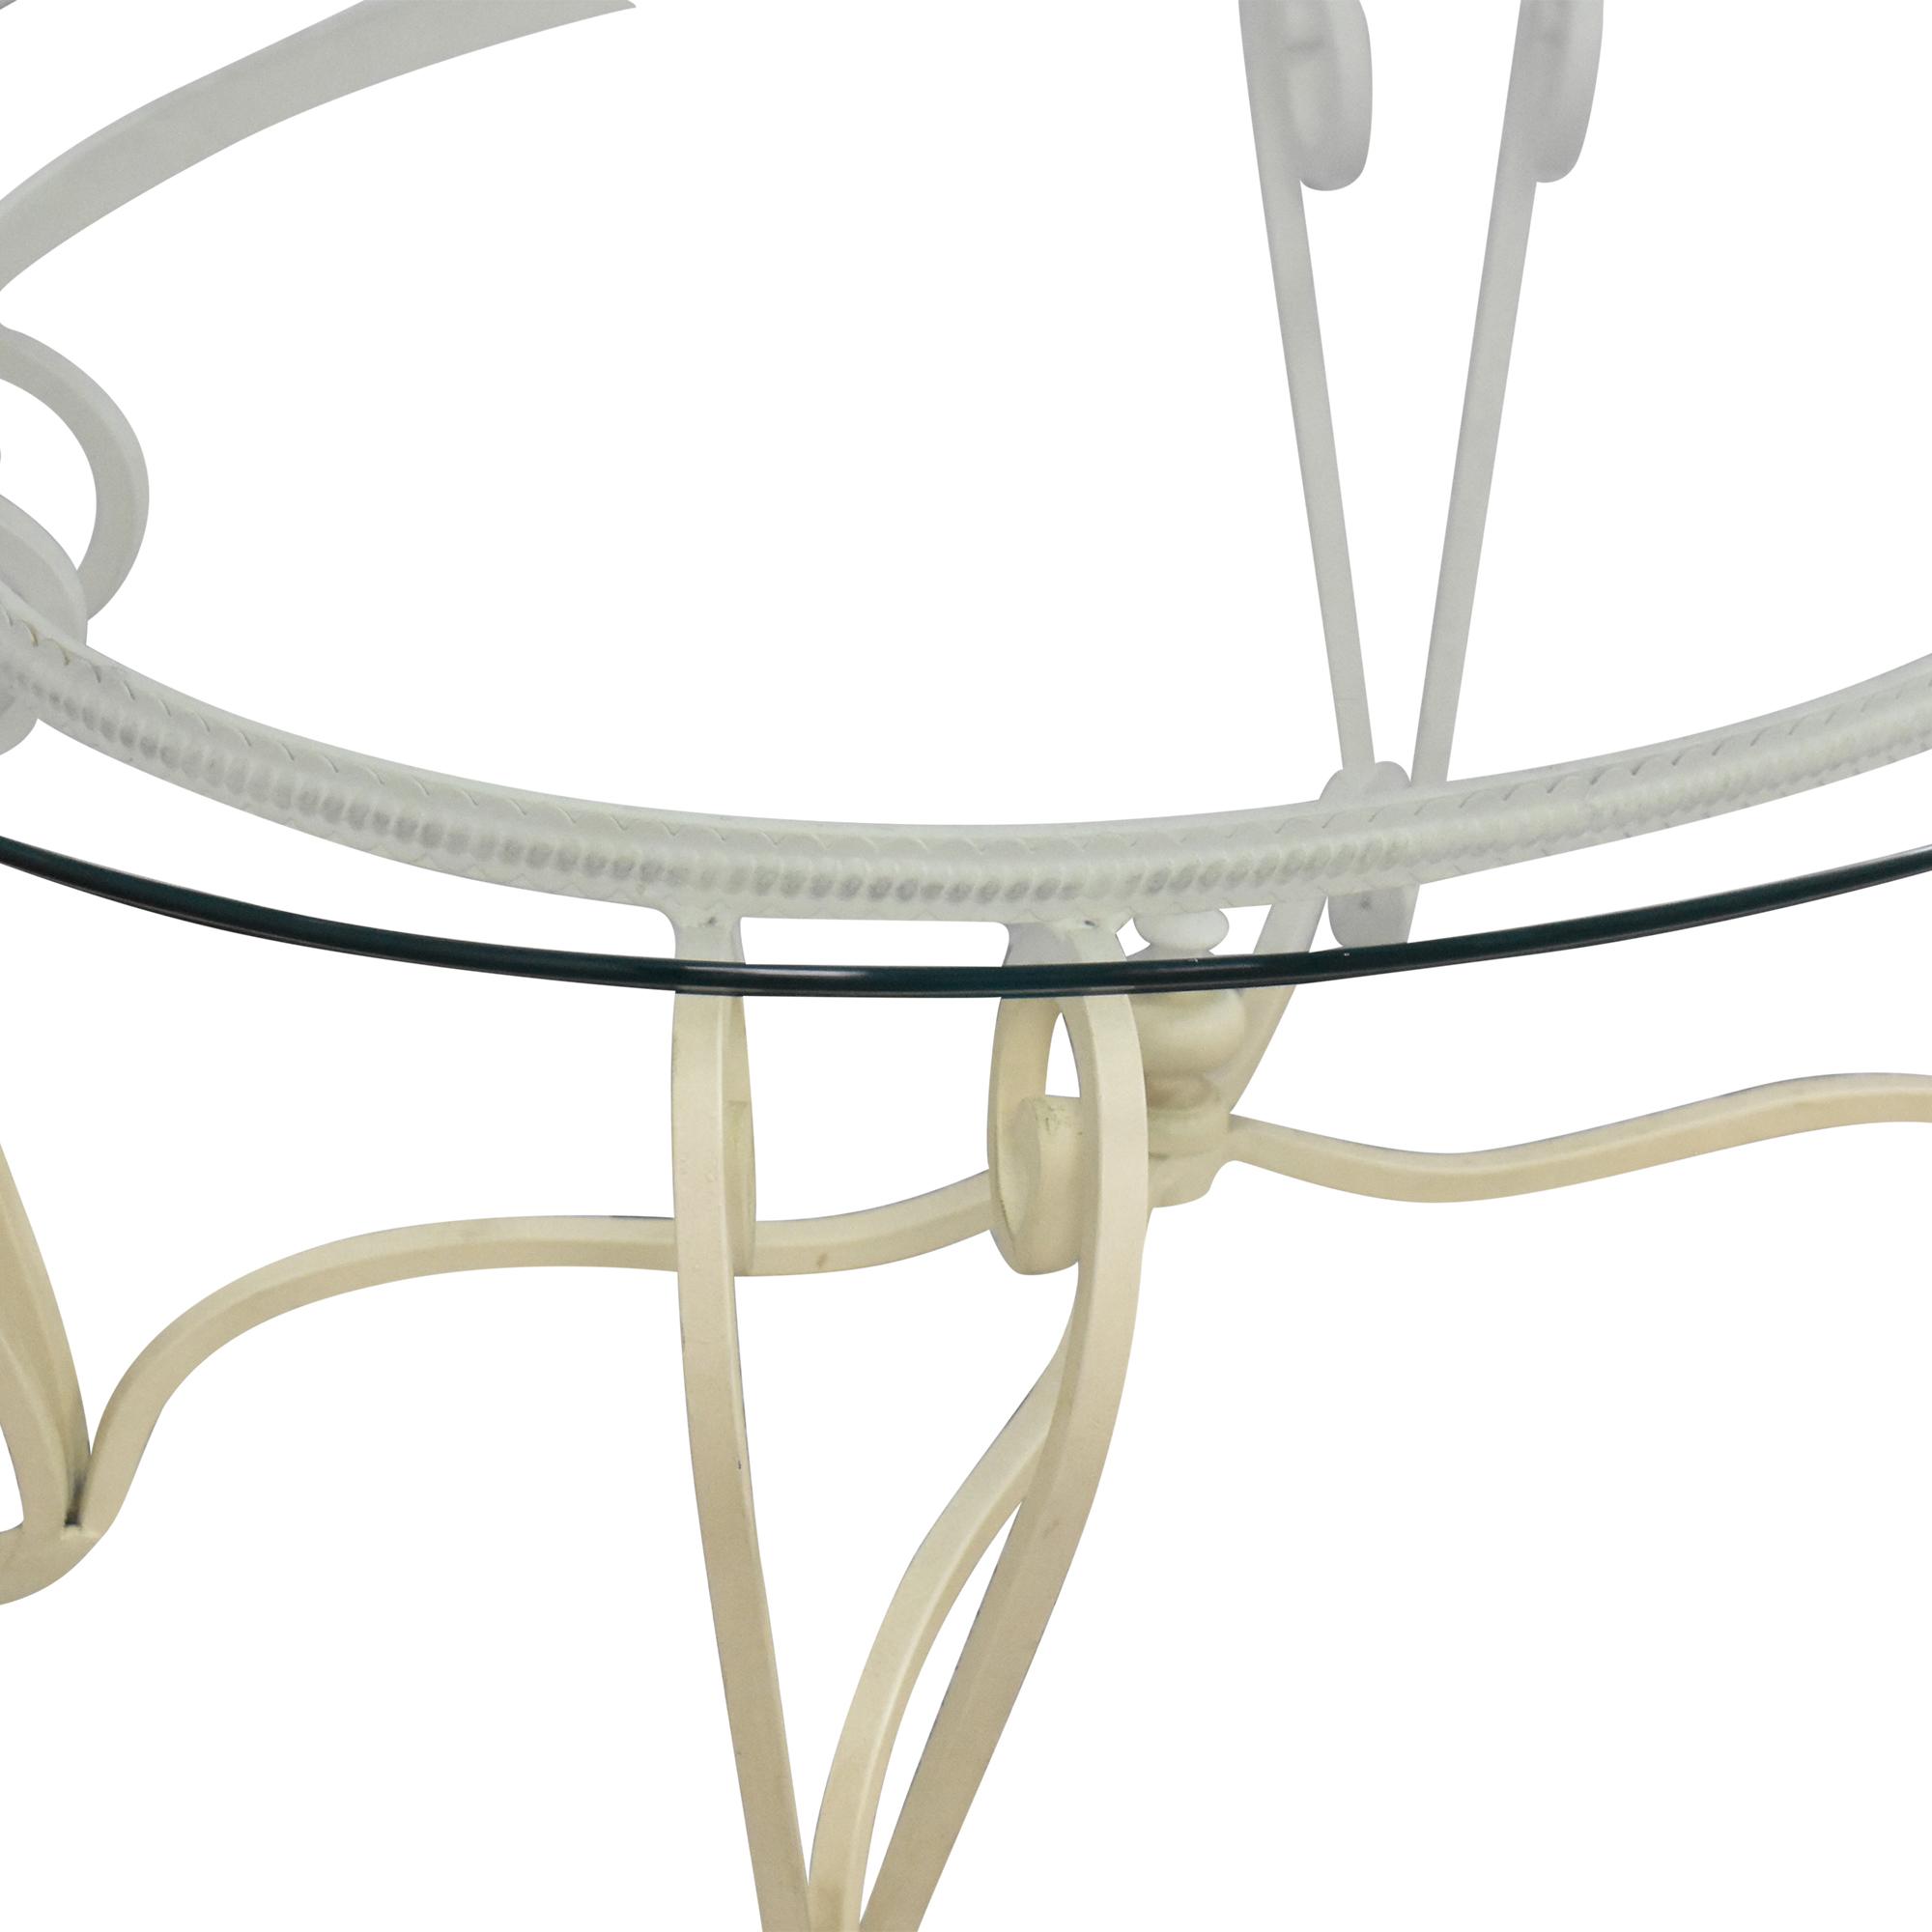 Ethan Allen Ethan Allen Oval Coffee Table